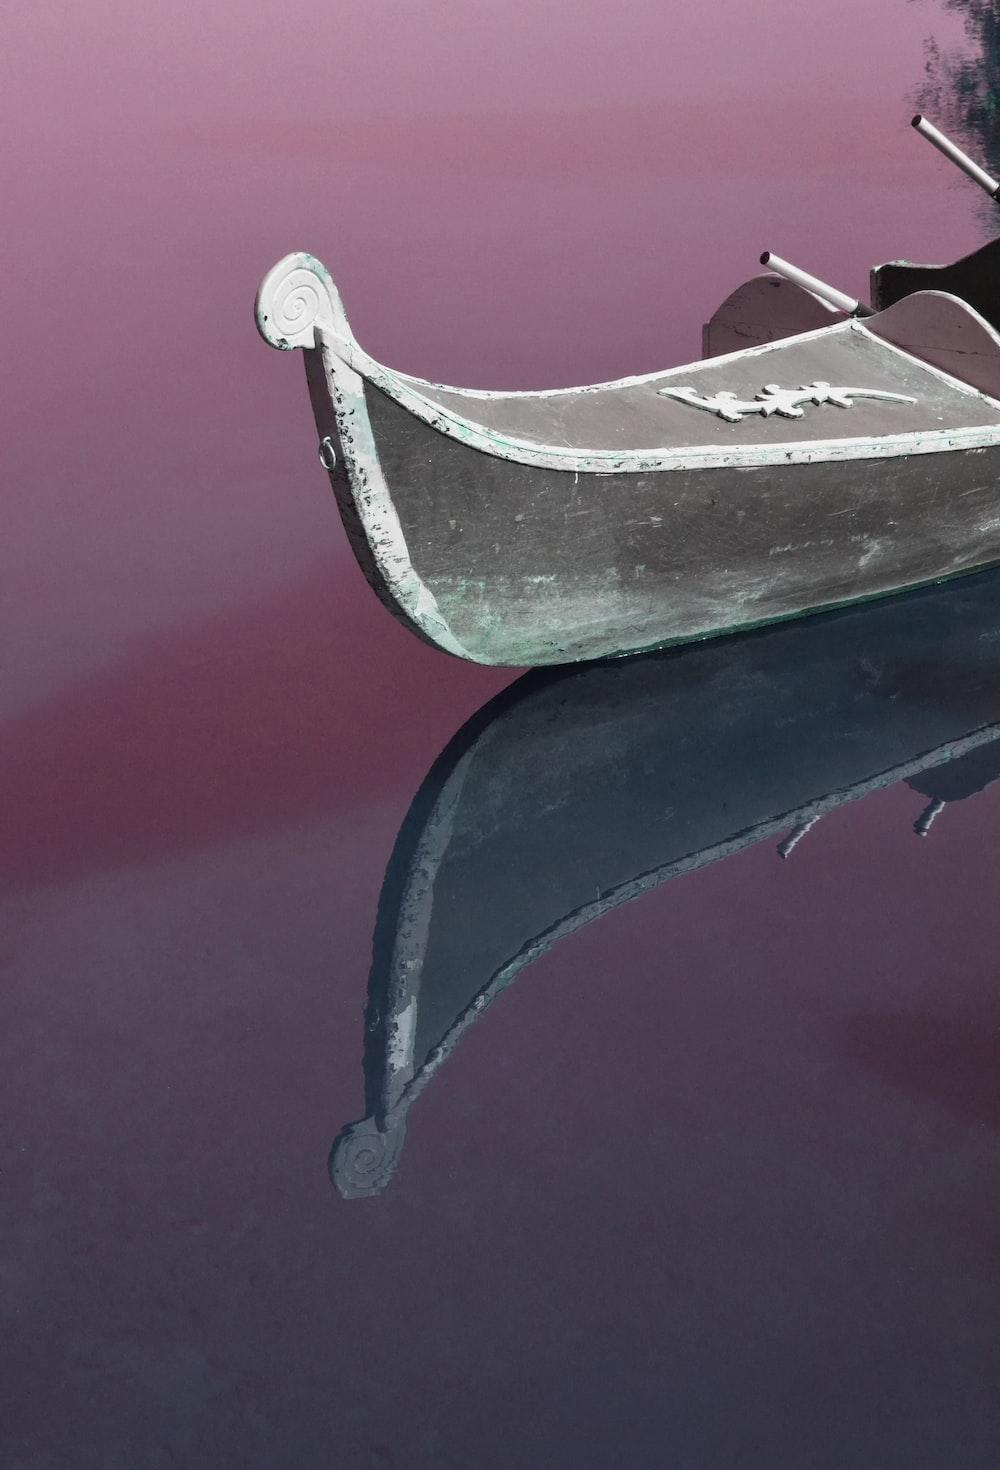 gray boat